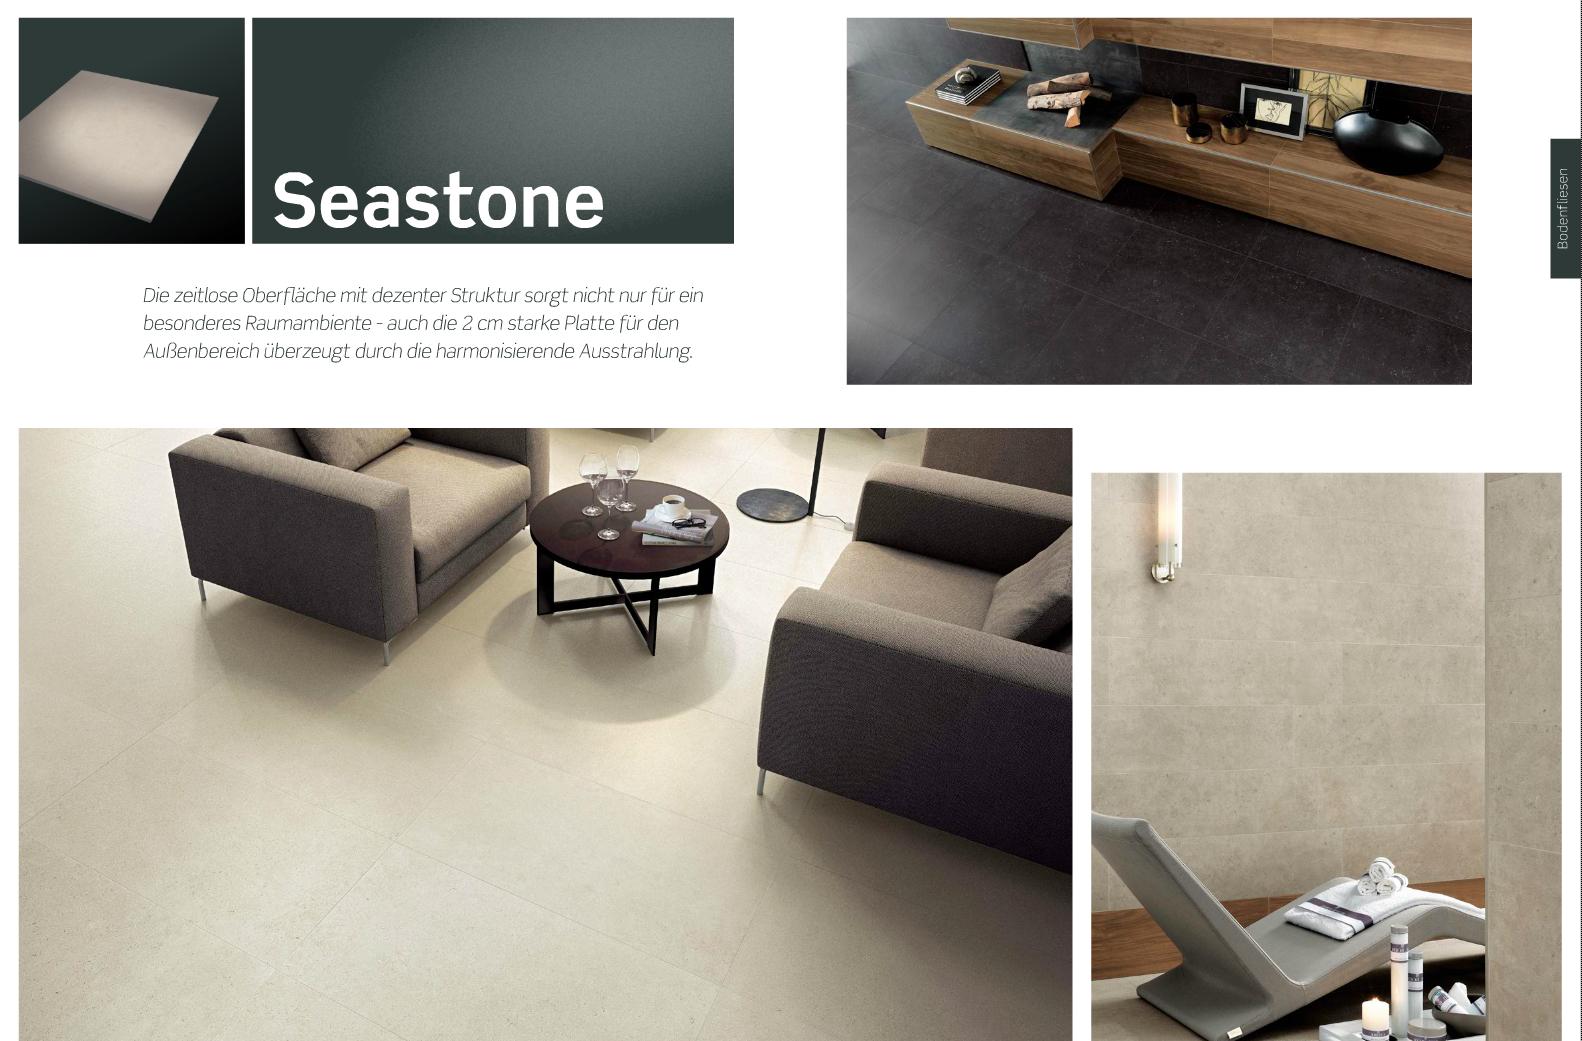 Bodenfliese Seastone